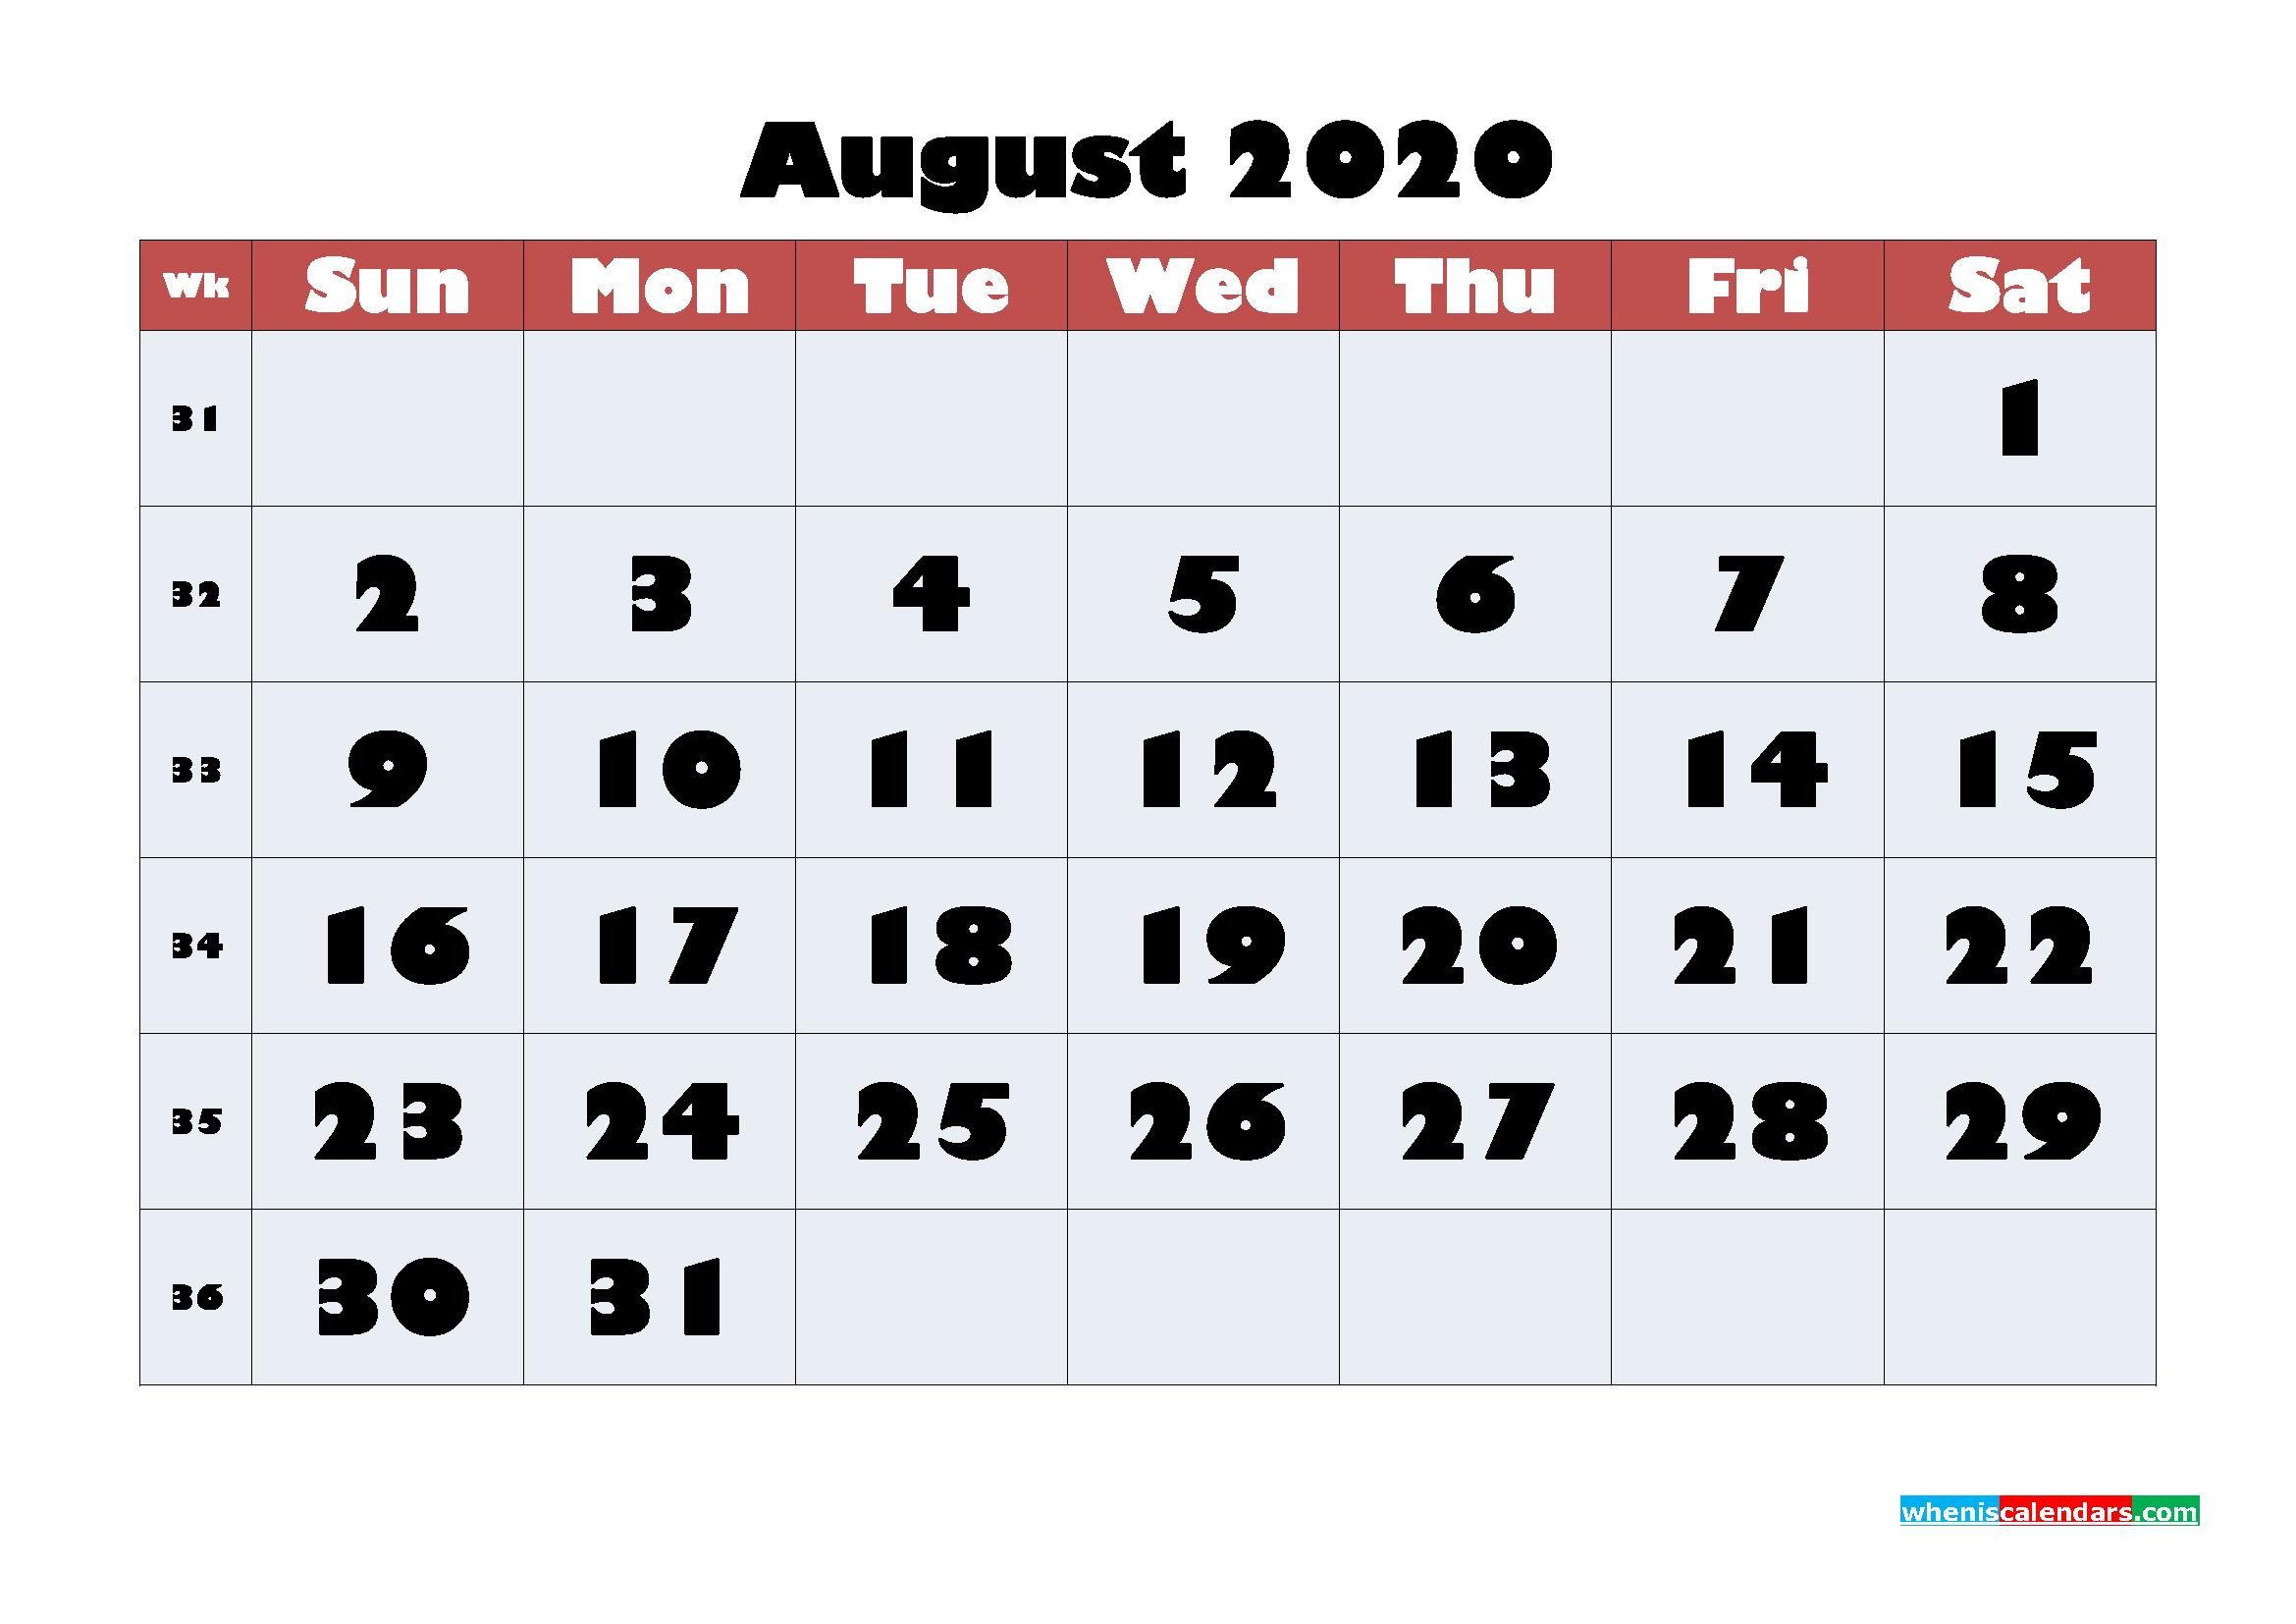 Free Blank Calendar August 2020 Printable - No.m20b620